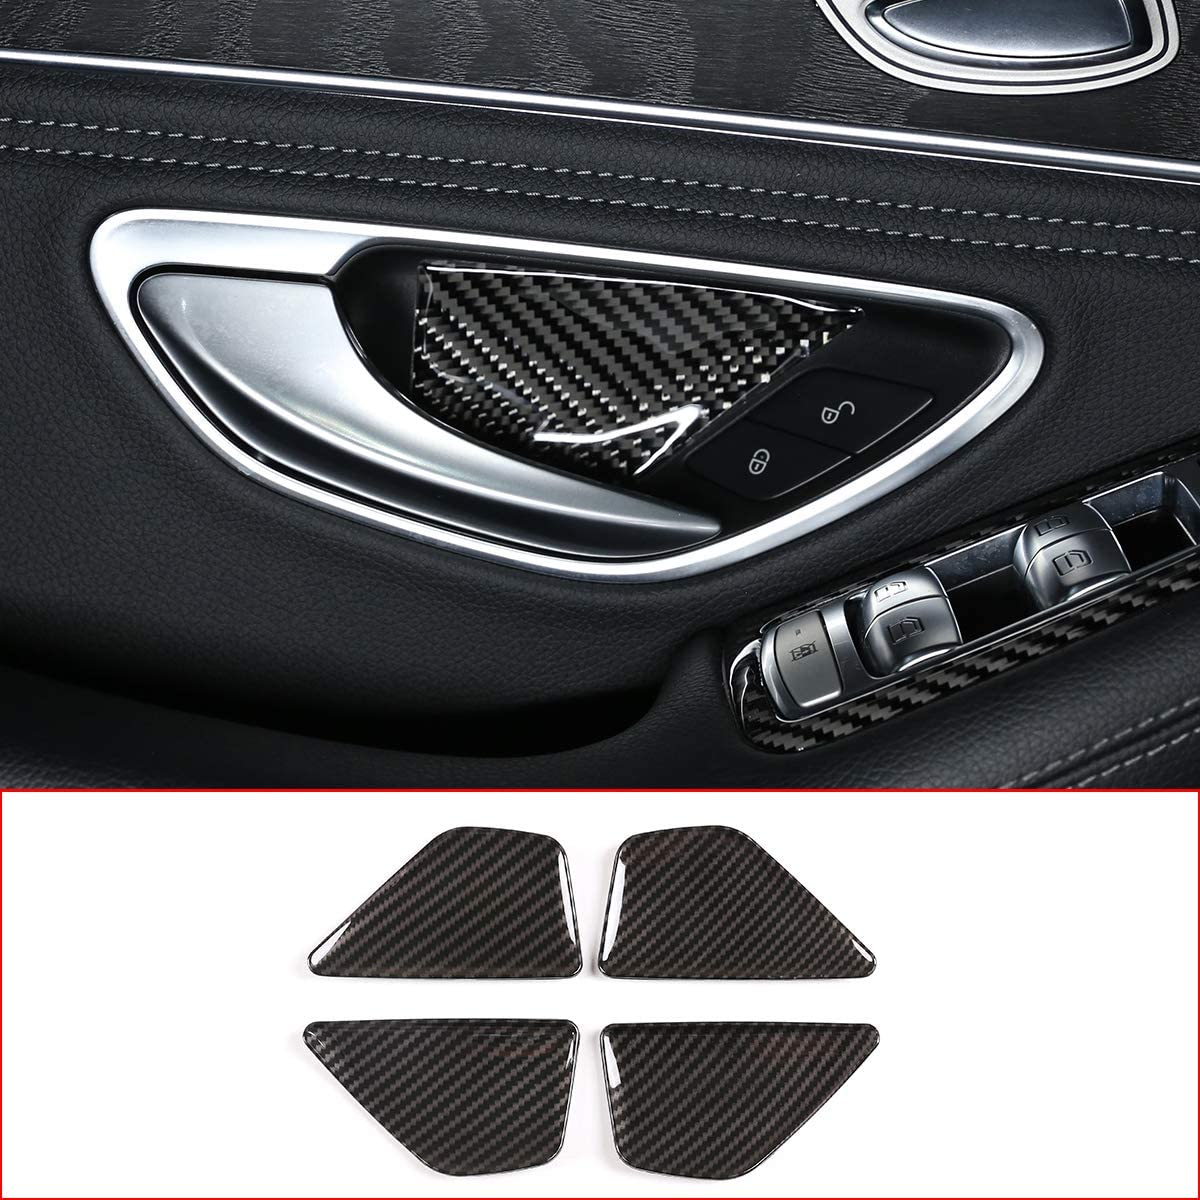 2020 E GLC W213 X243 2016 DIYUCAR T/ürsch/üsselabdeckung f/ür MB Benz C-Klasse W205 2015 Autozubeh/ör 2020 ABS-Kohlefaser